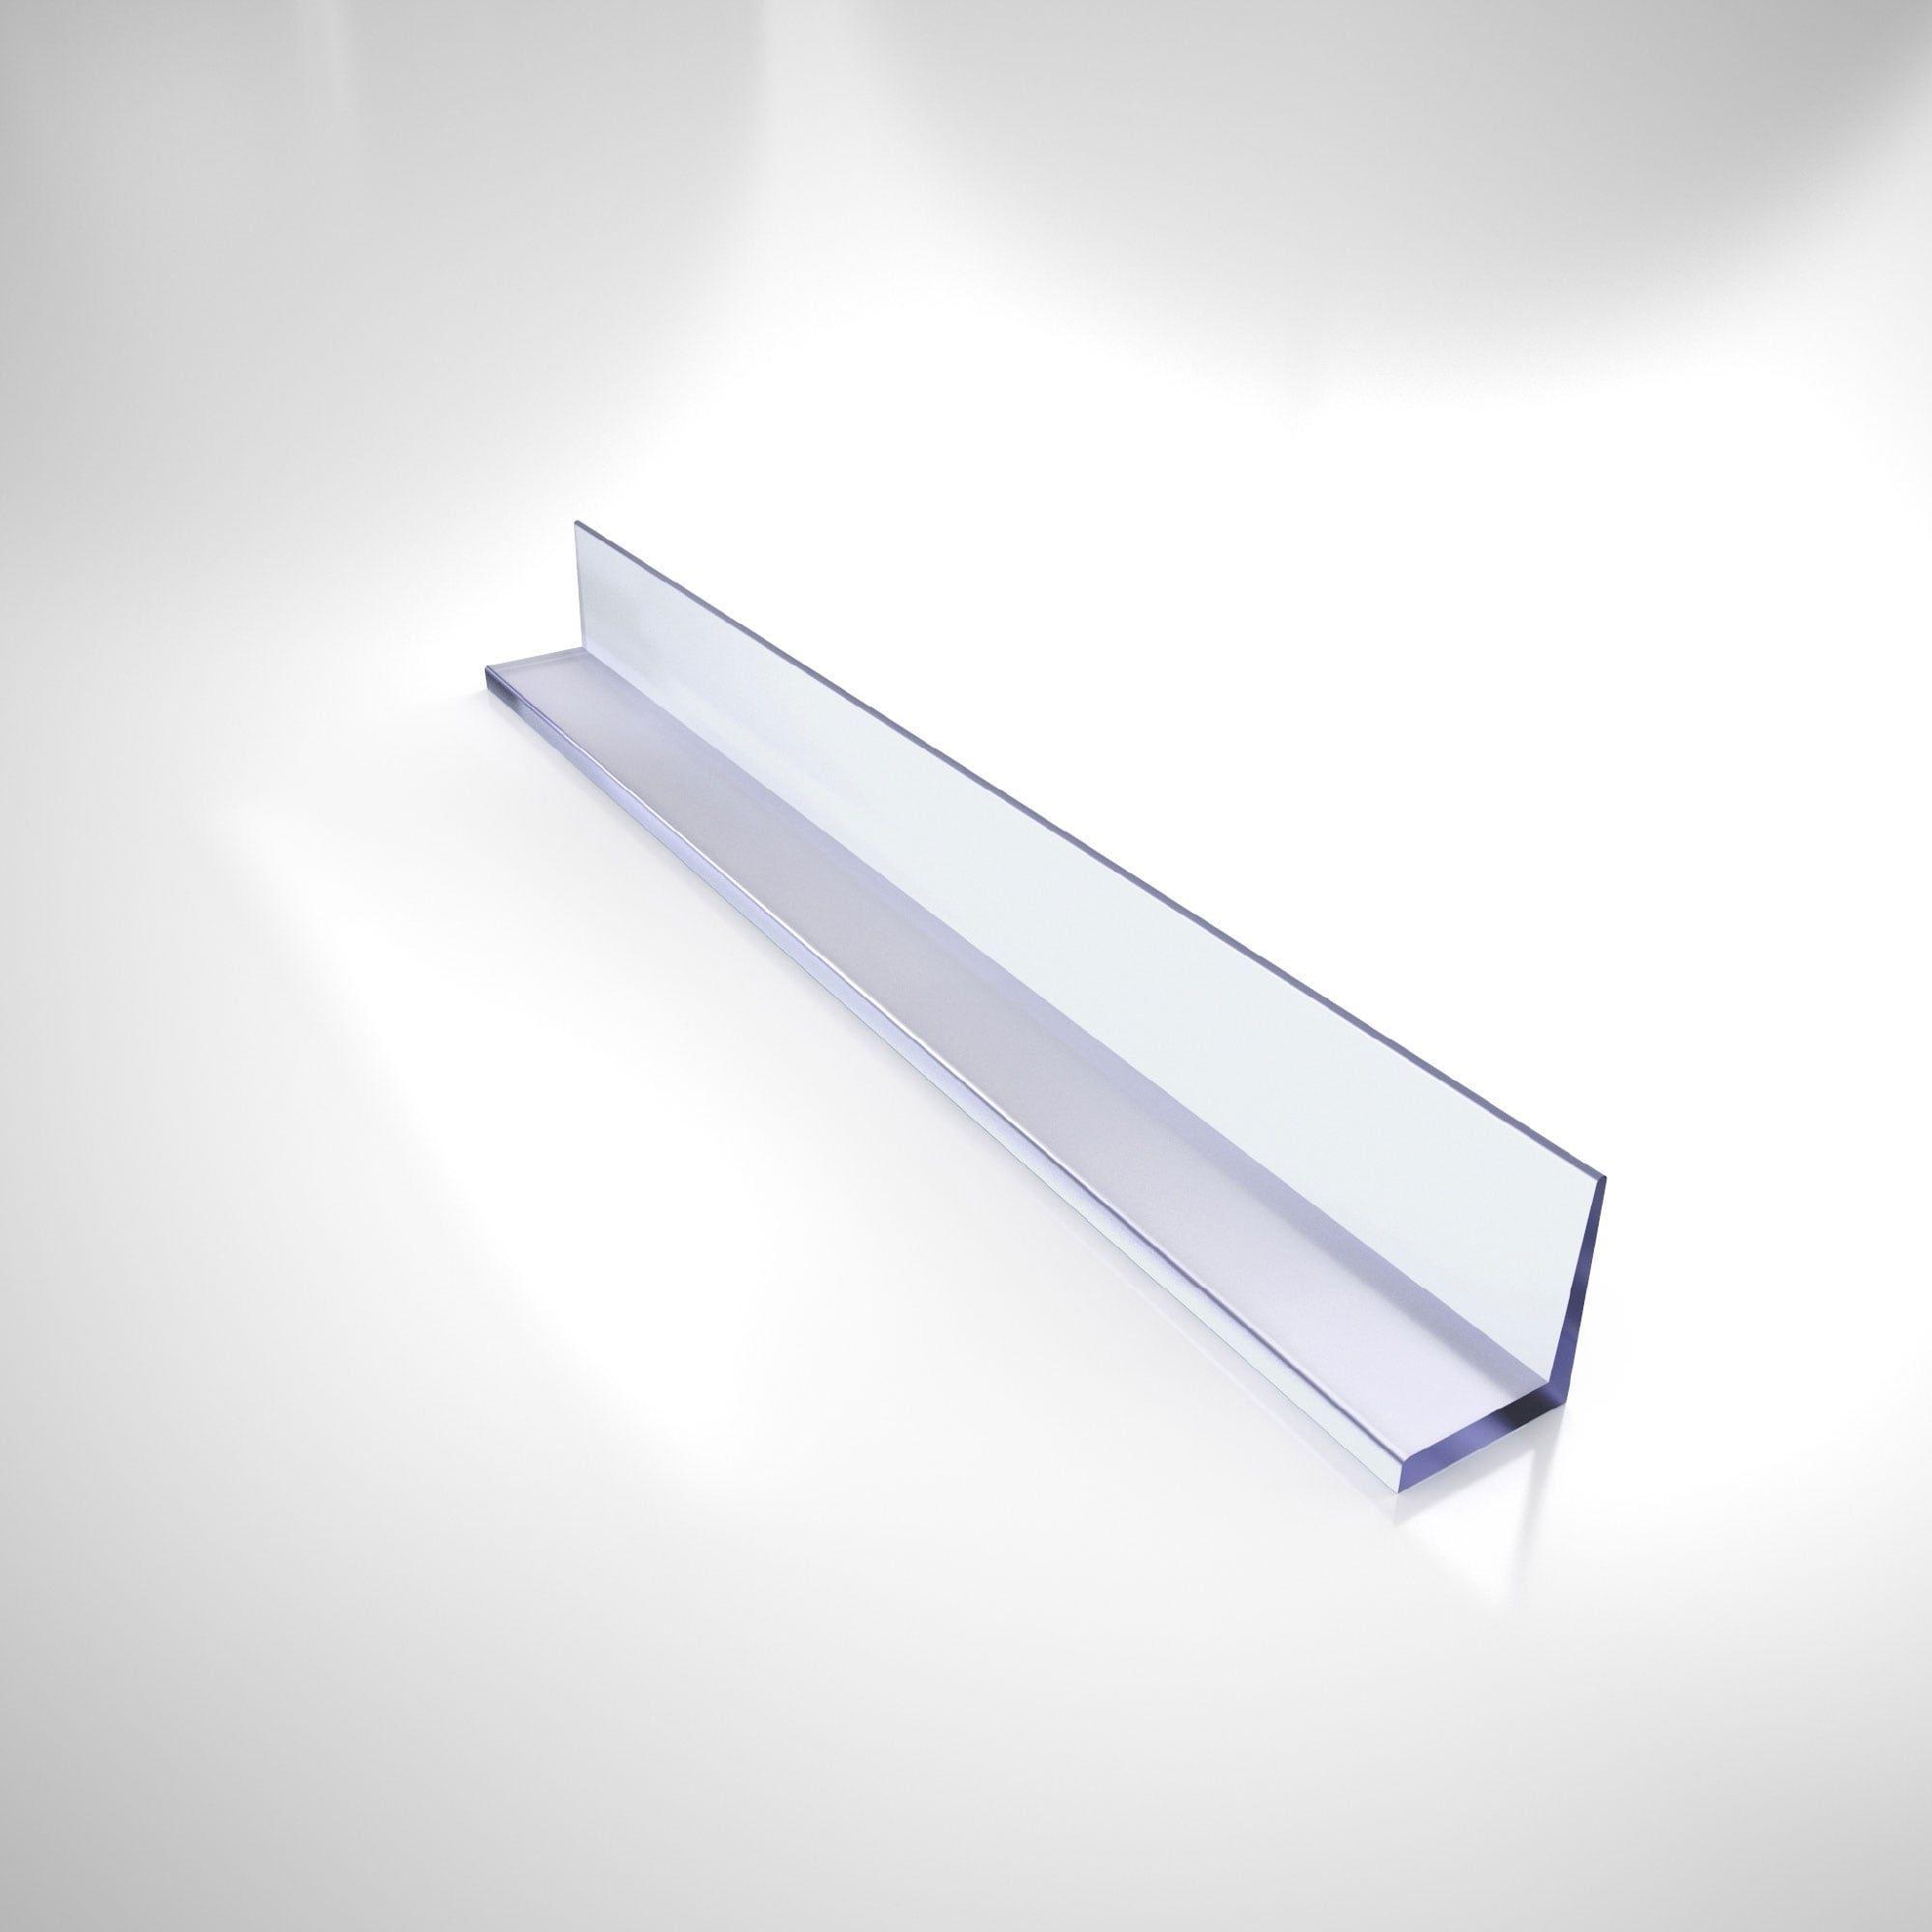 Dreamline Jt055 Clear Vinyl Seal 75 1 3 In Length For 5 16 In 8 Mm Glass Shower Door Vinyl Glass Shower Doors Dreamline Glass Shower